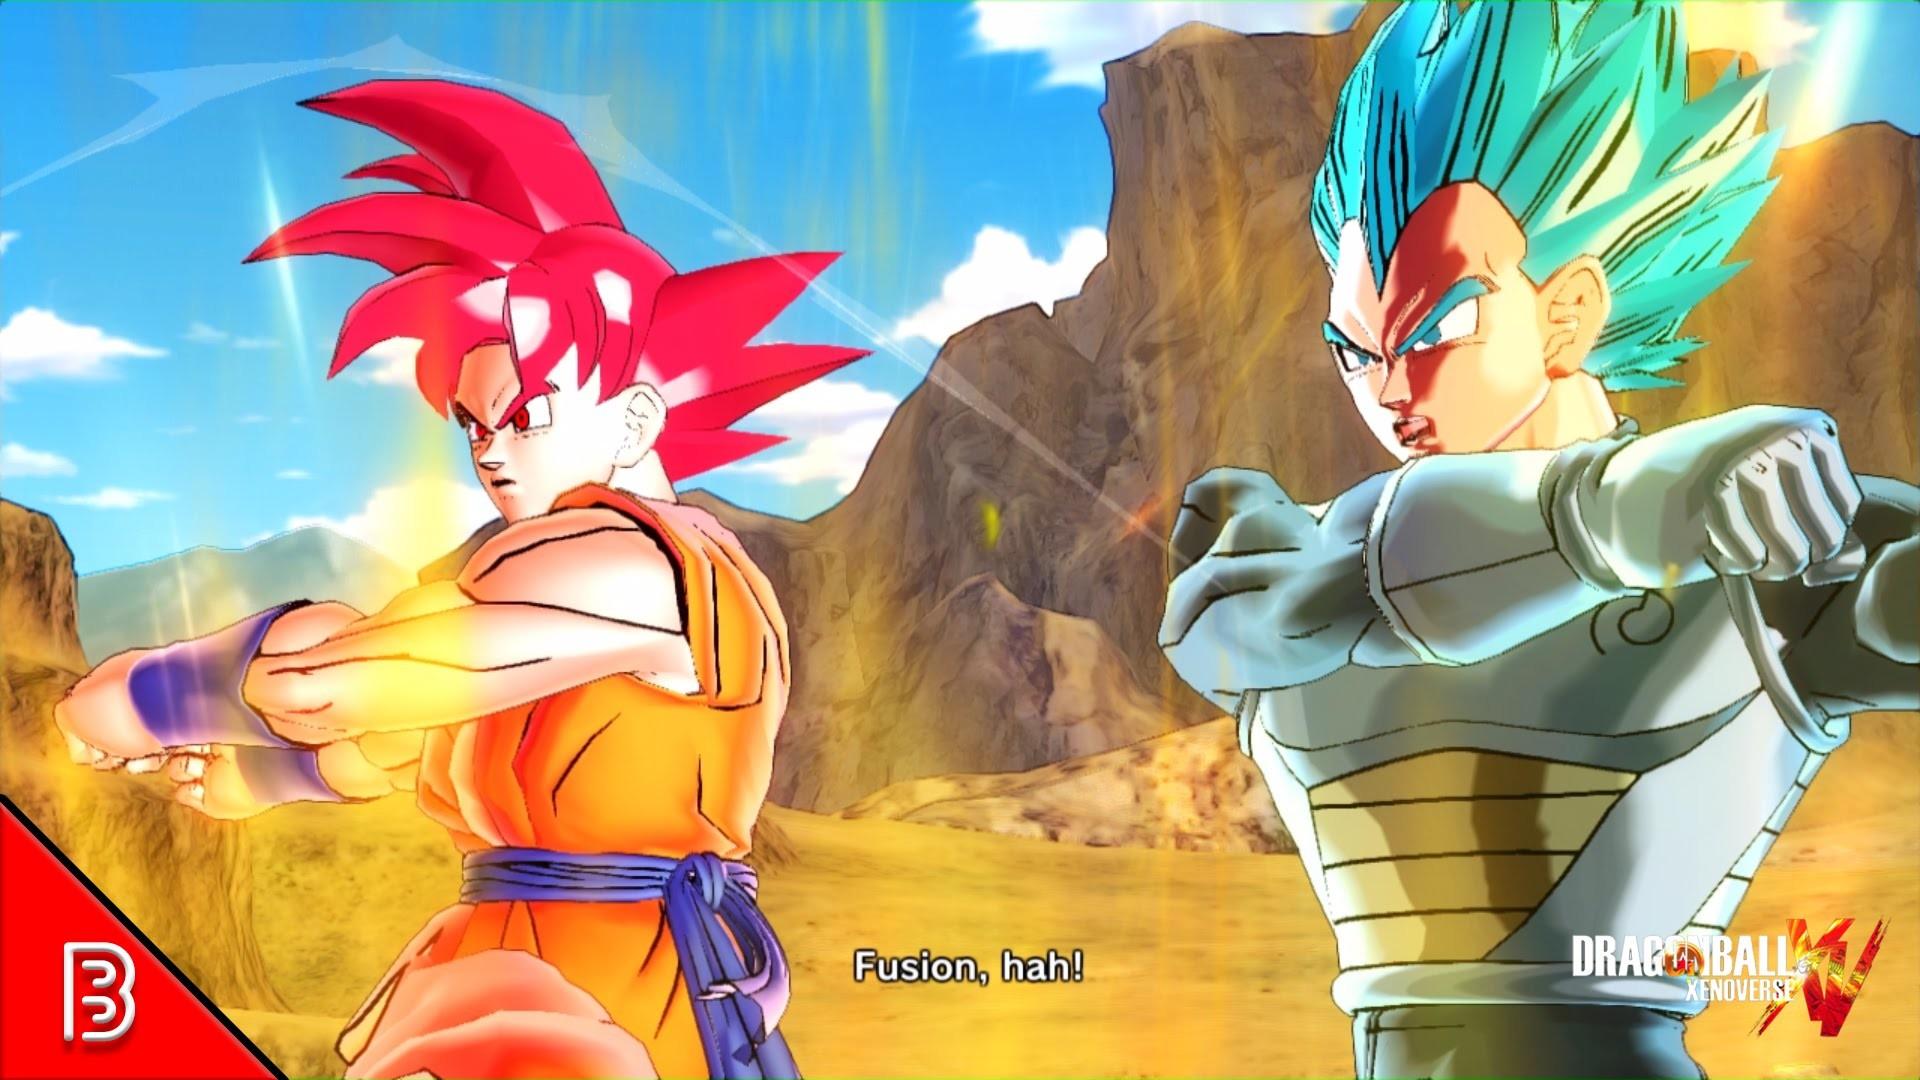 Super Saiyan God Goku + Super Saiyan Blue Vegeta Fusion = ?!   Xenoverse  [Episode 125] – YouTube